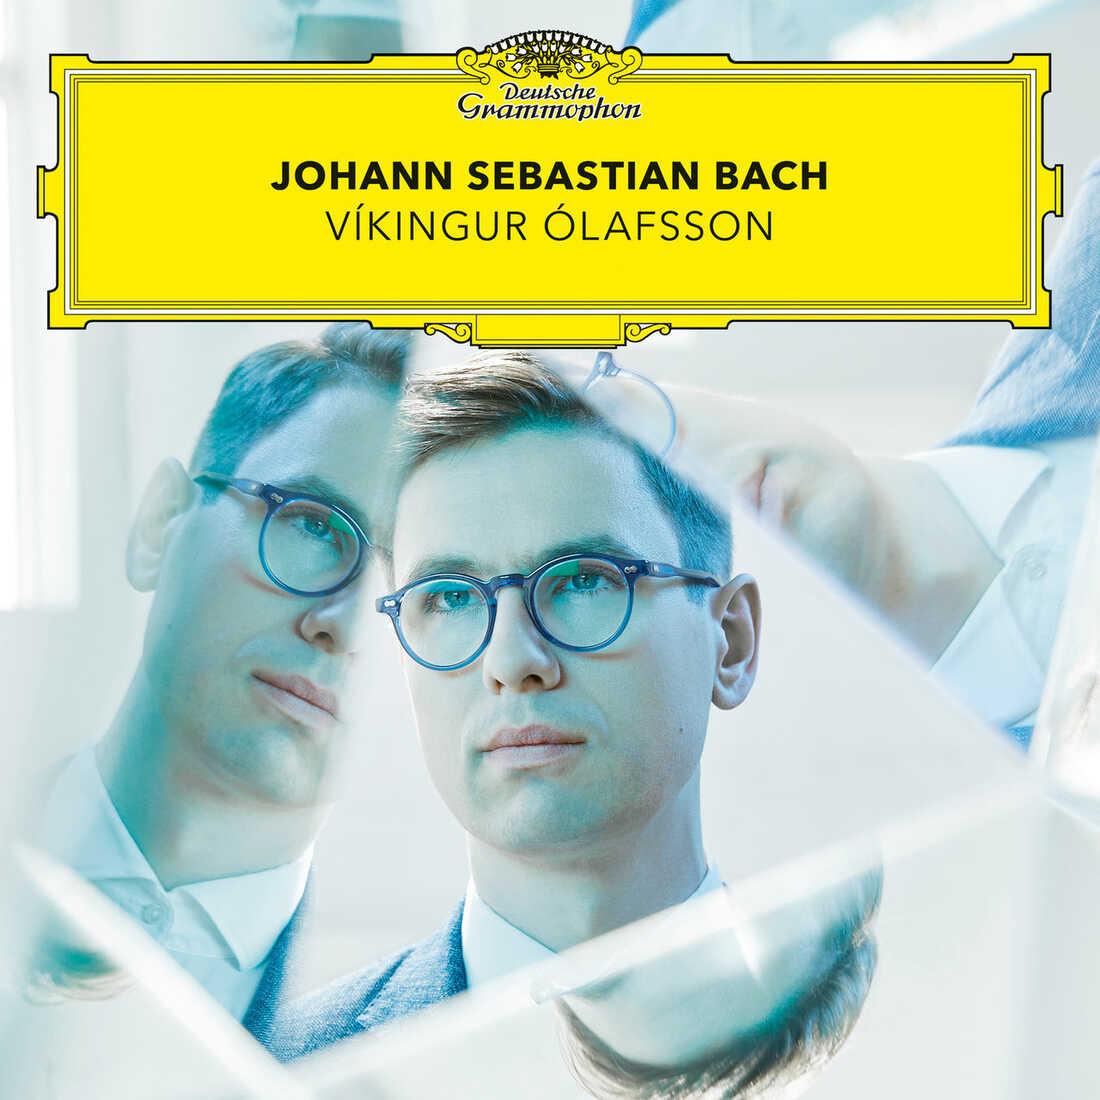 Víkingur Ólafsson, Johann Sebastian Bach